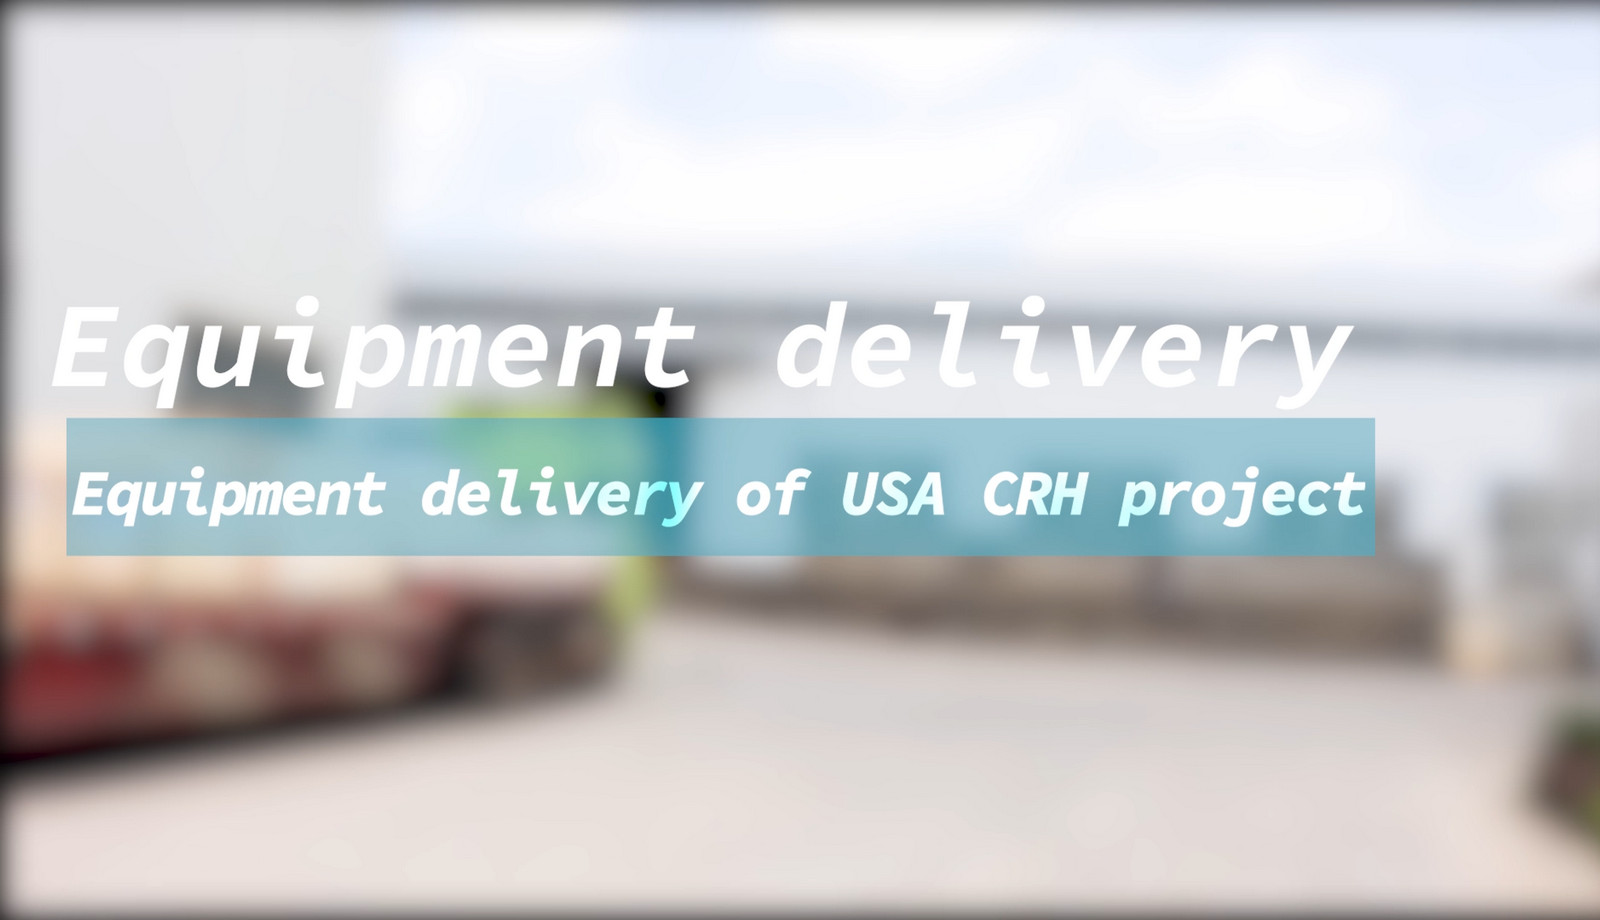 Equipment Devilery of USA CRH Project